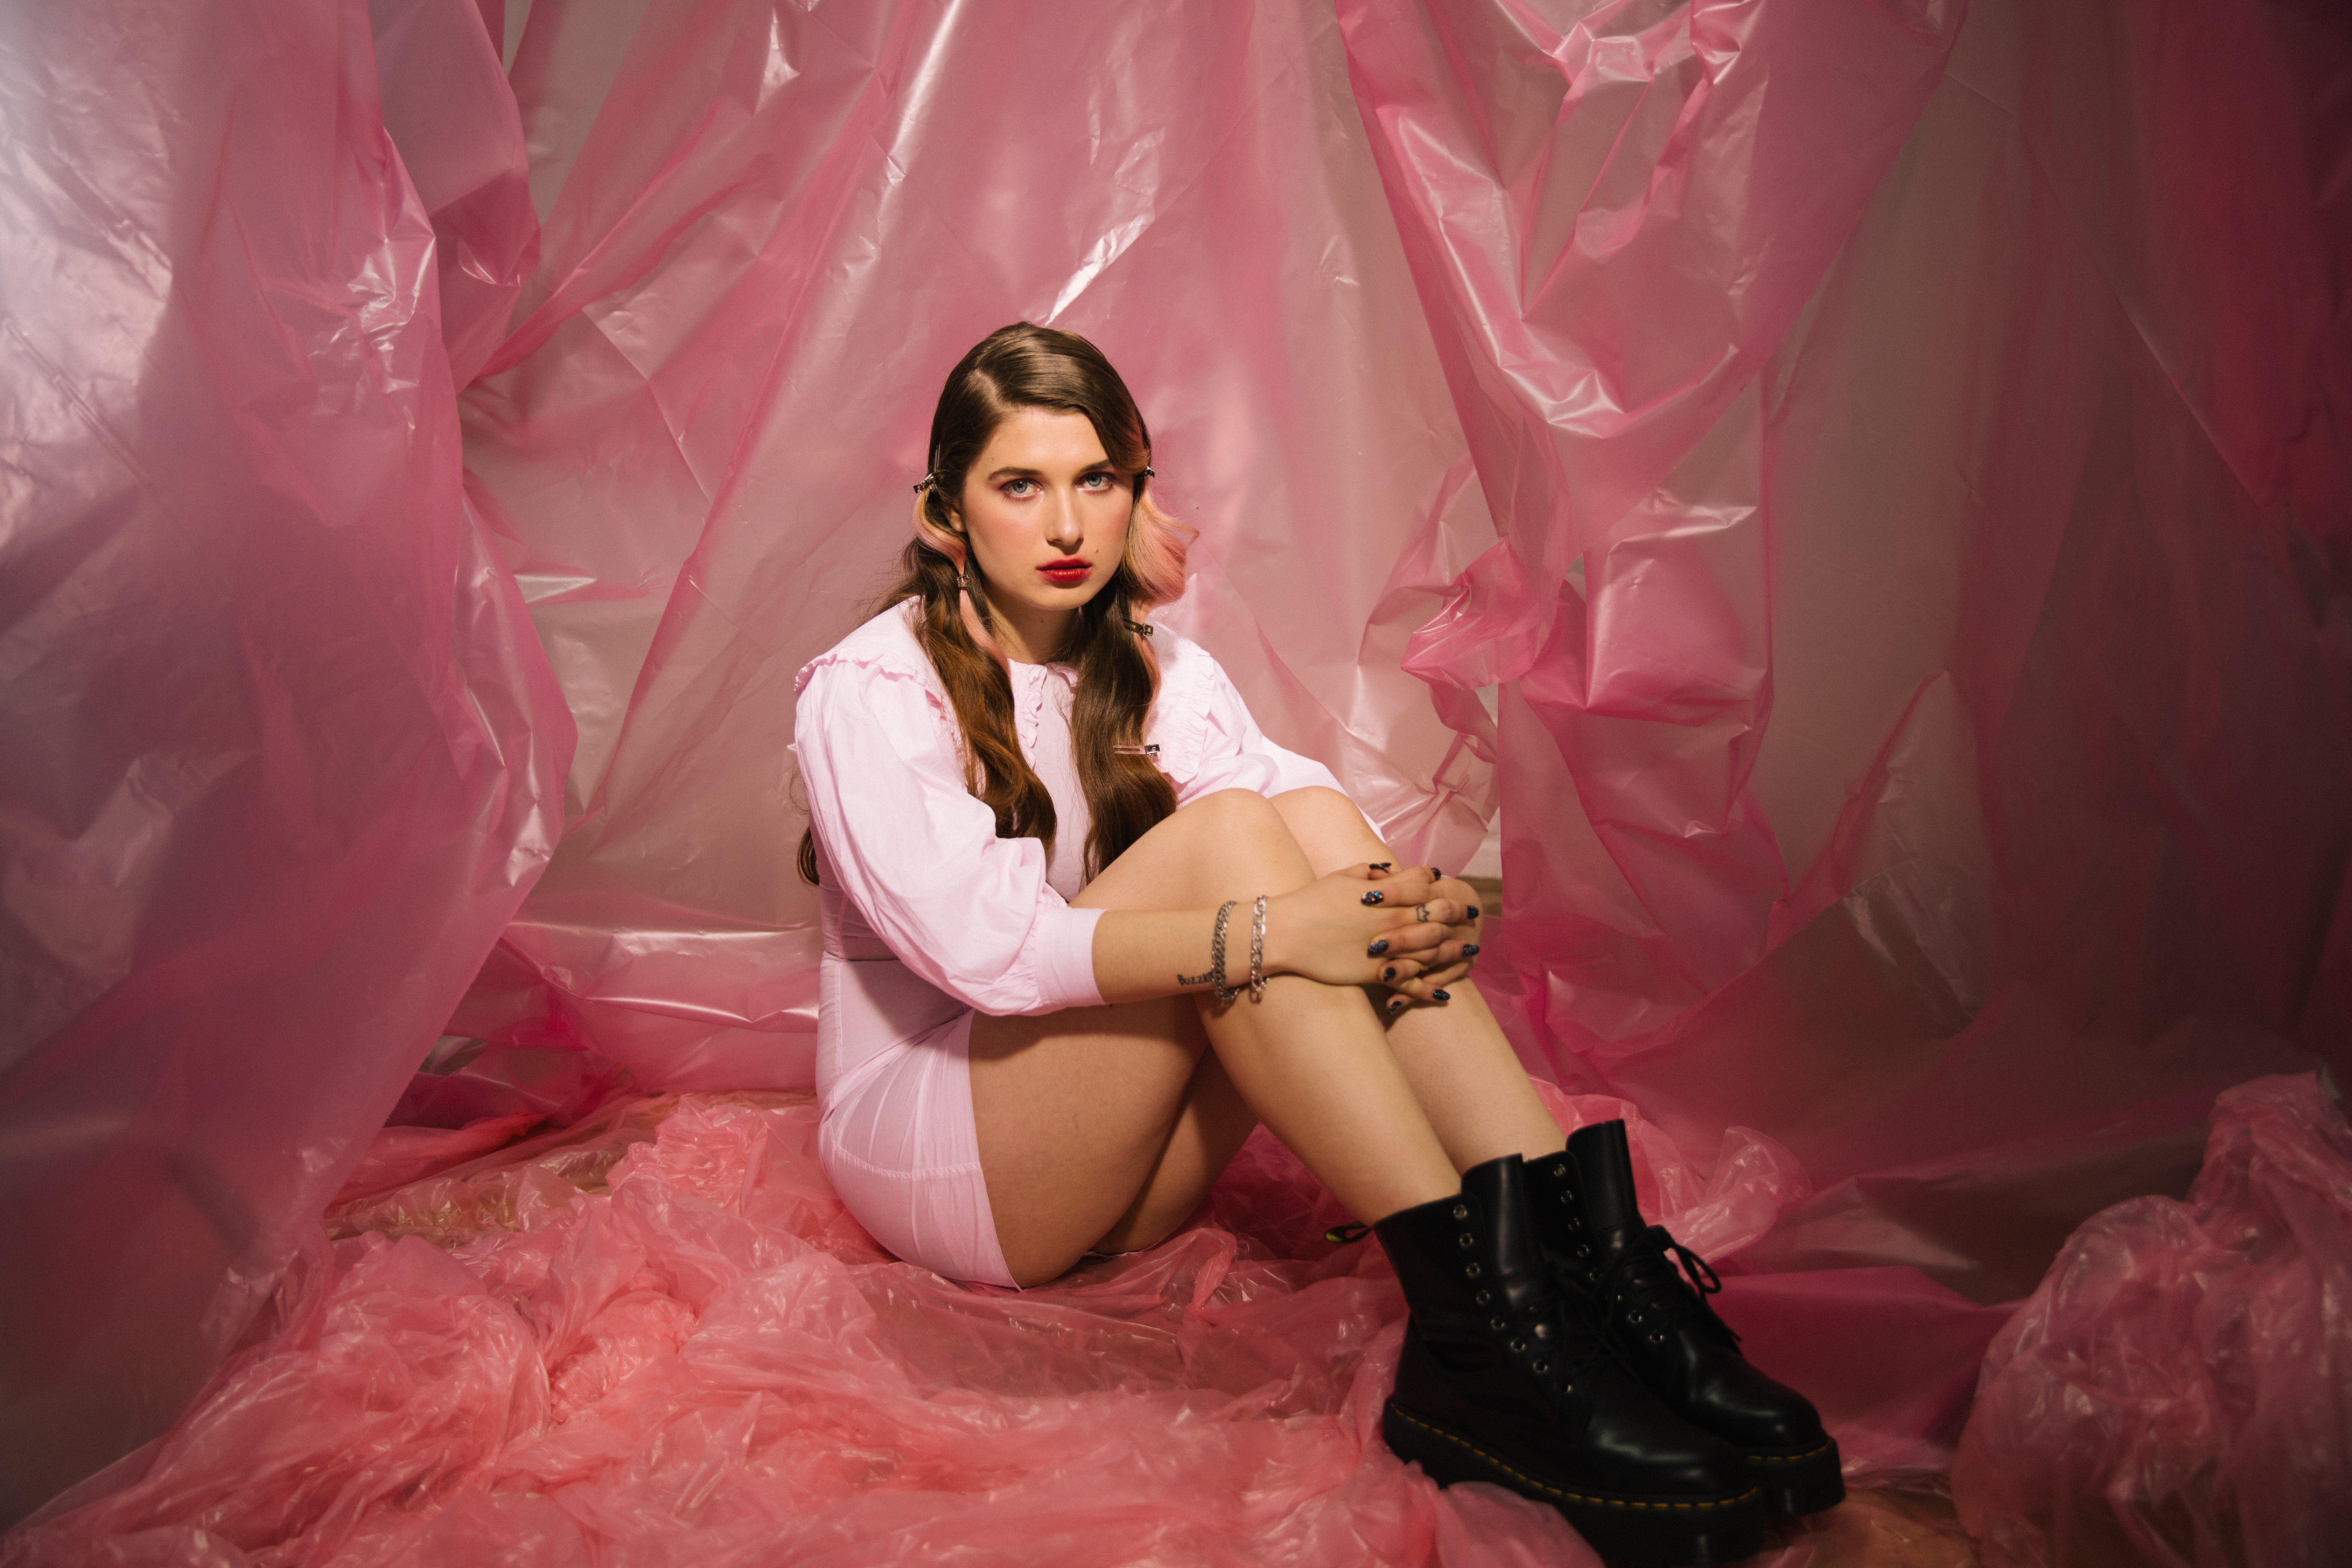 Baby Queen - KAO Magazine webzine et blog de musique émergente